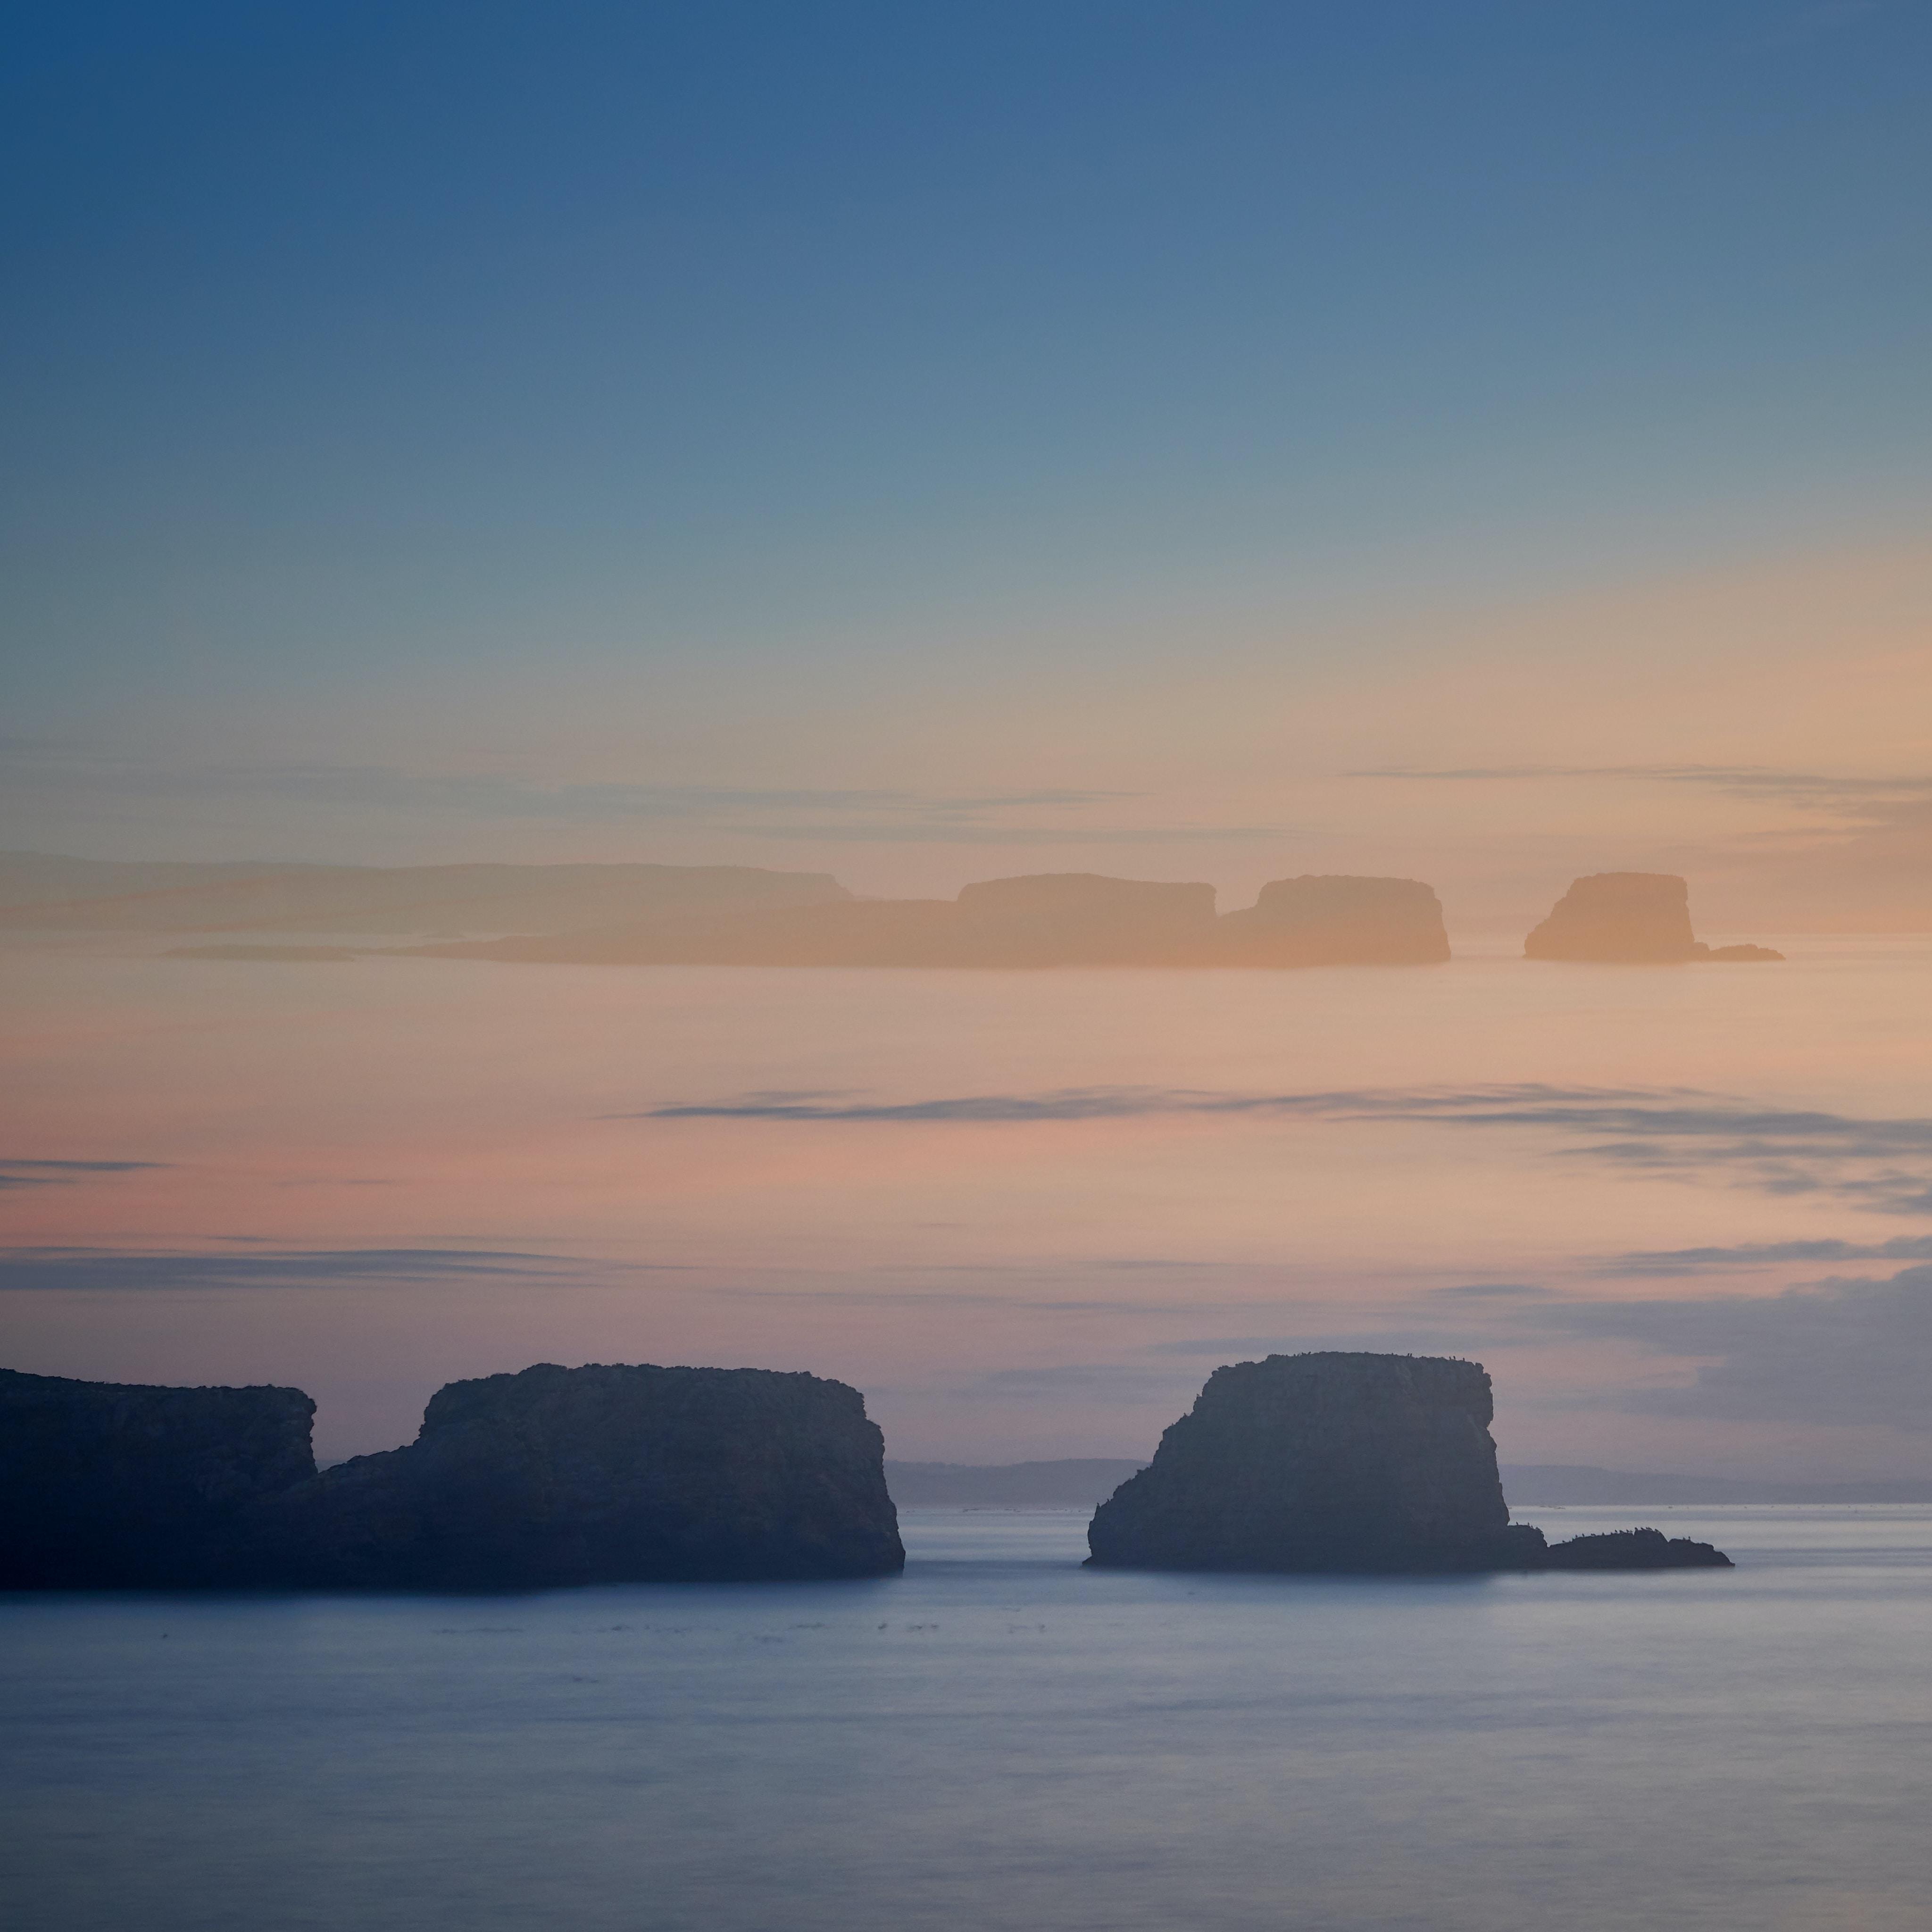 landscape photo of ocean during daytime